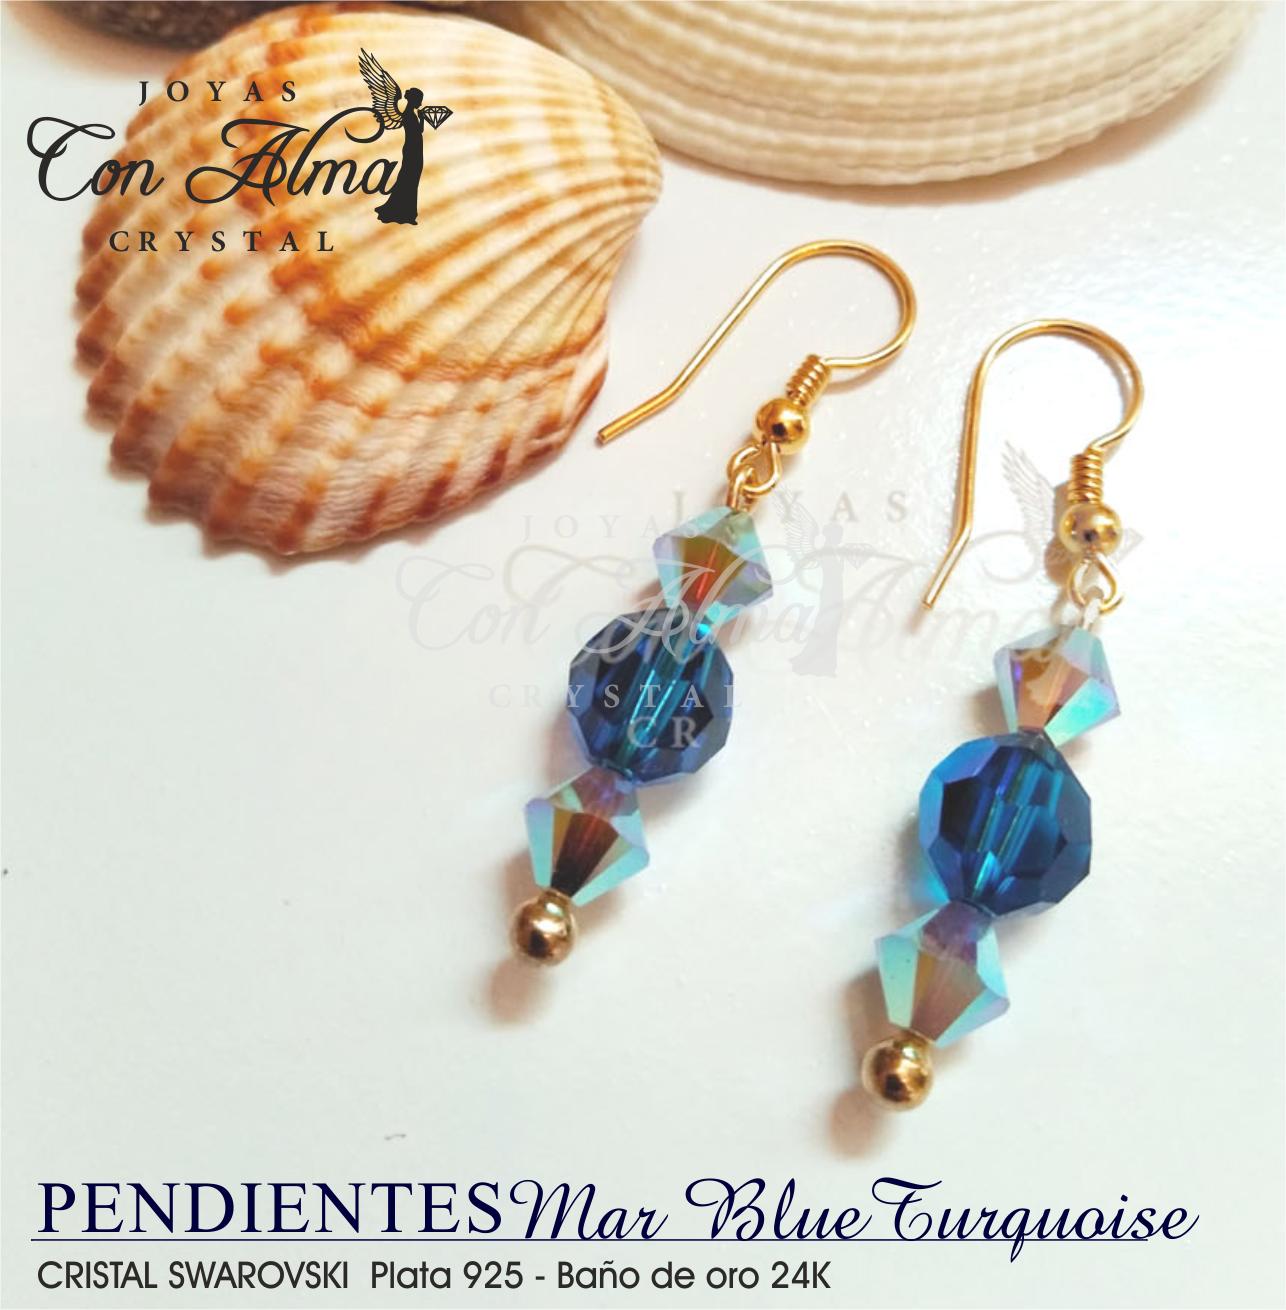 Pendientes Blue Turquoise 26,90 €